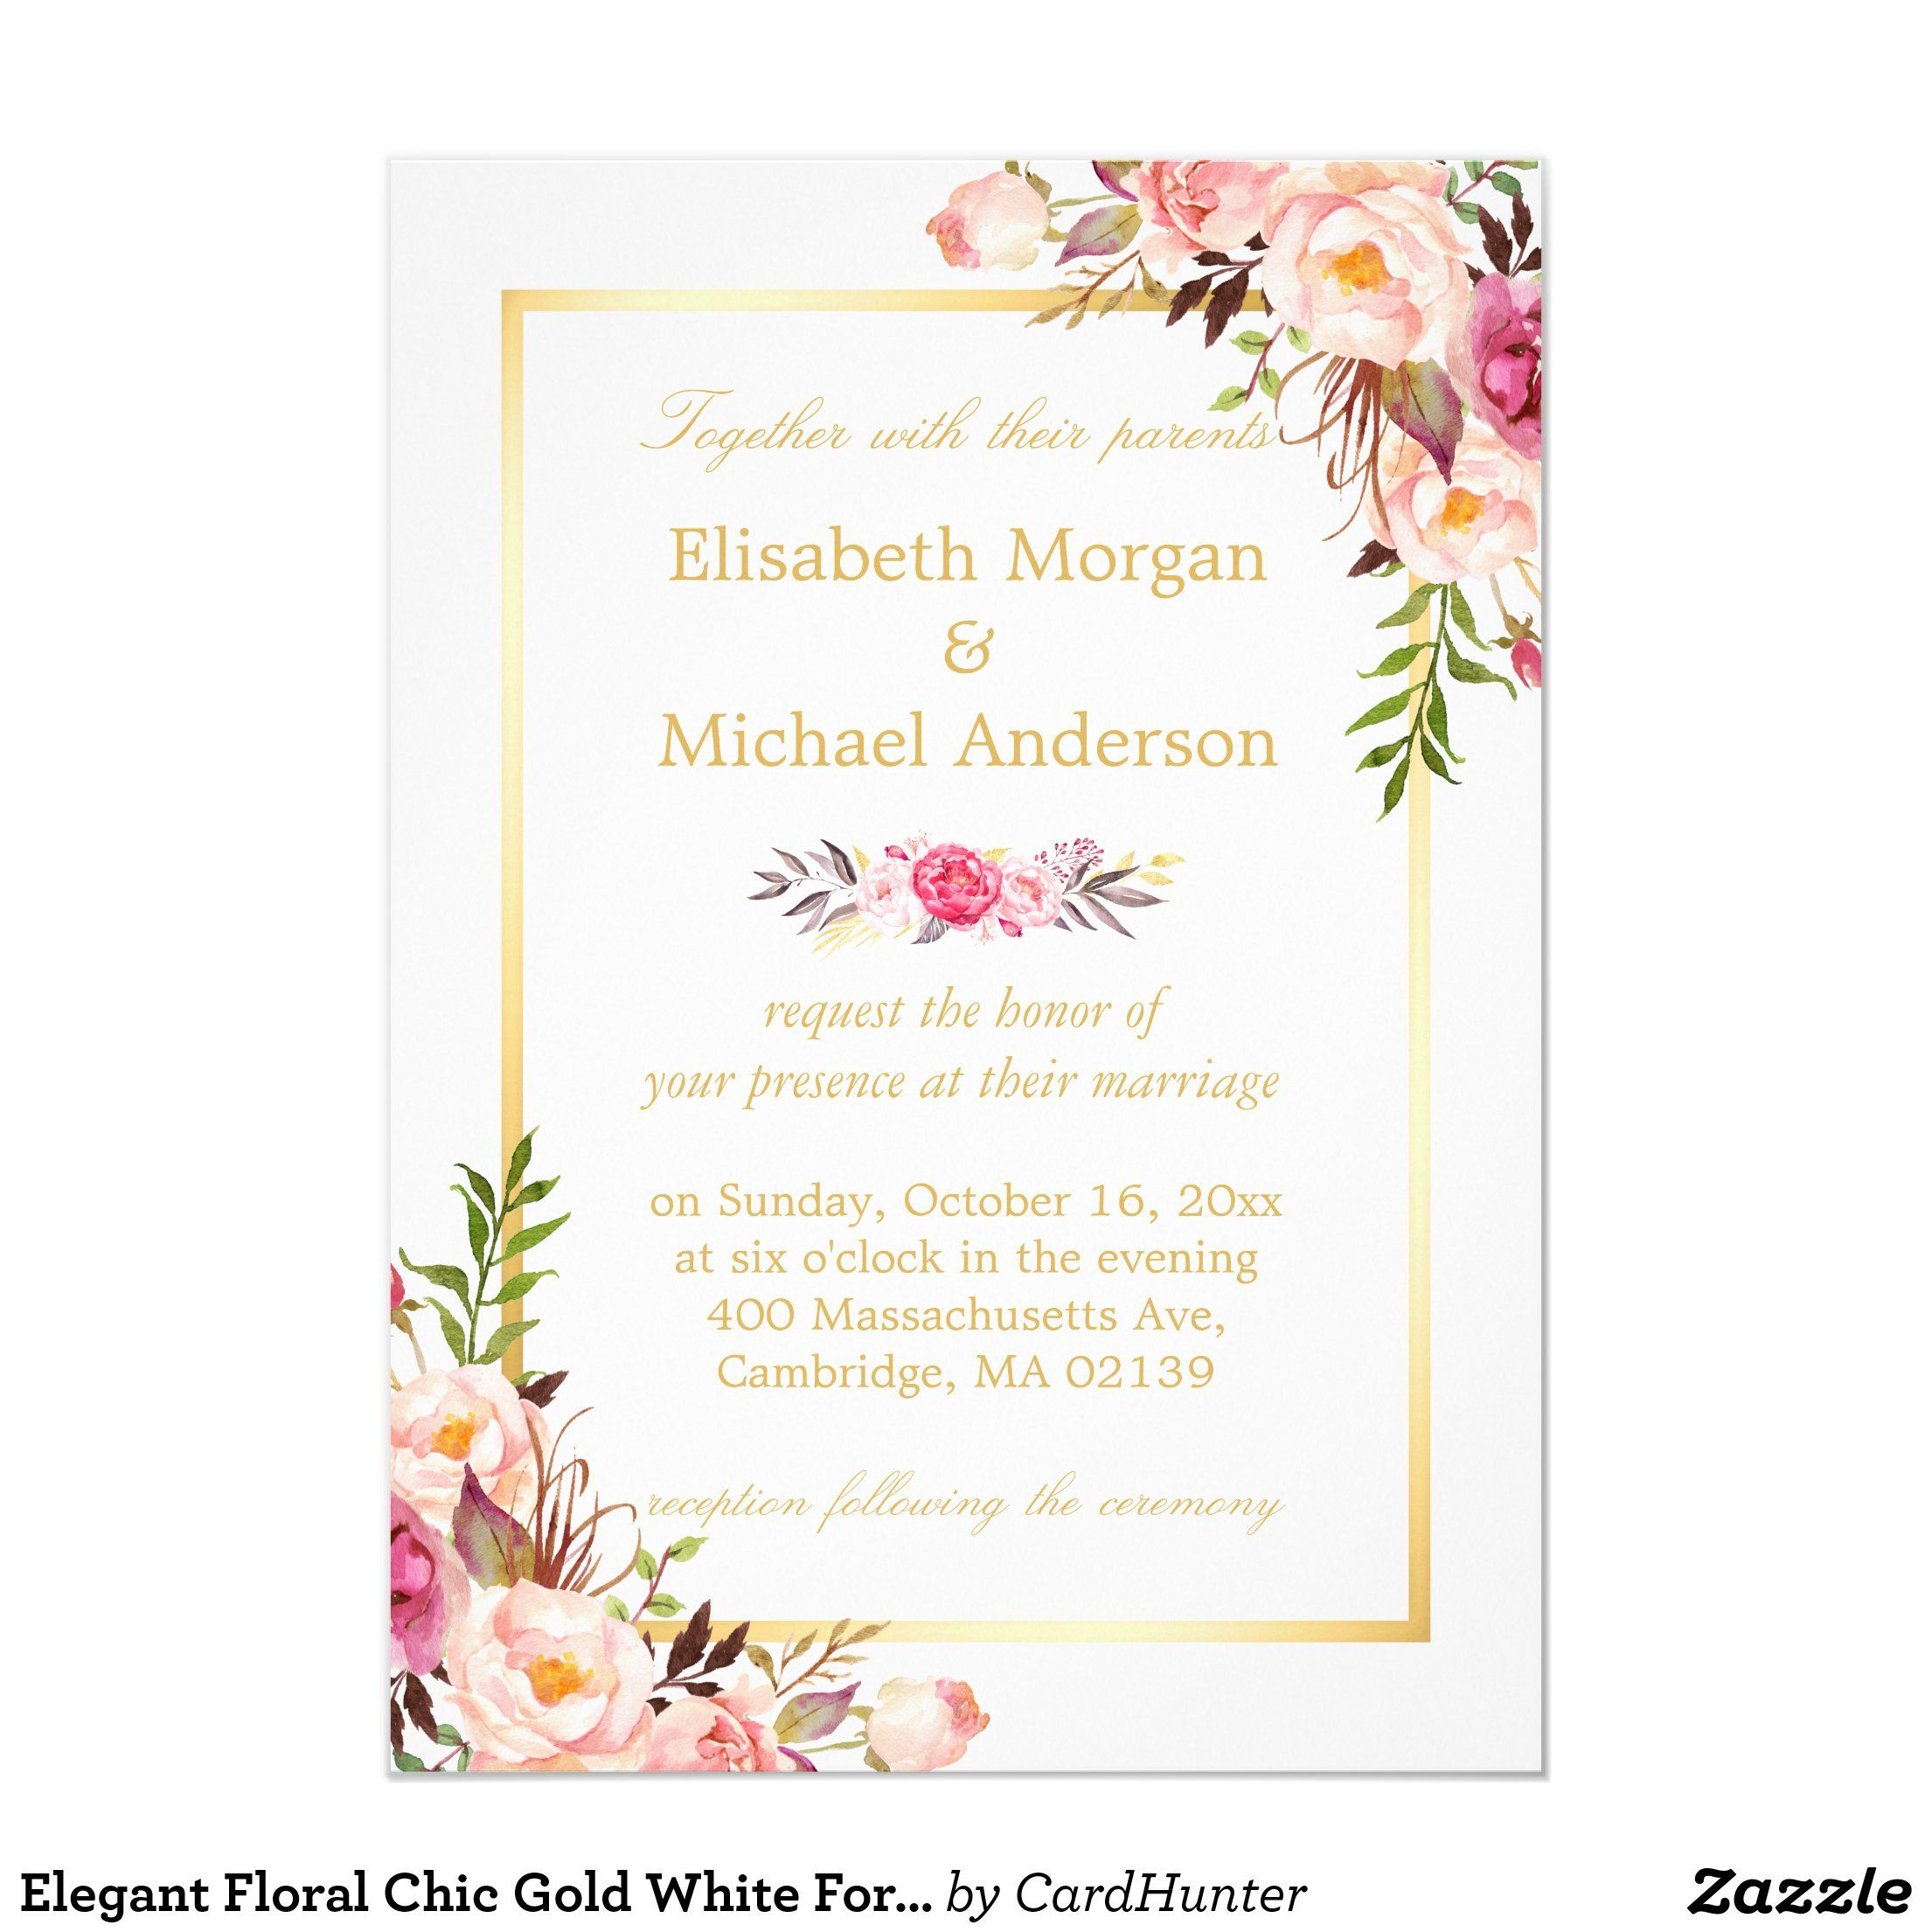 Elegant Floral Chic Gold White Formal Wedding Invitation Zazzle Co Uk In 2020 Formal Wedding Invitations Floral Wedding Invitations Fall Wedding Invitations